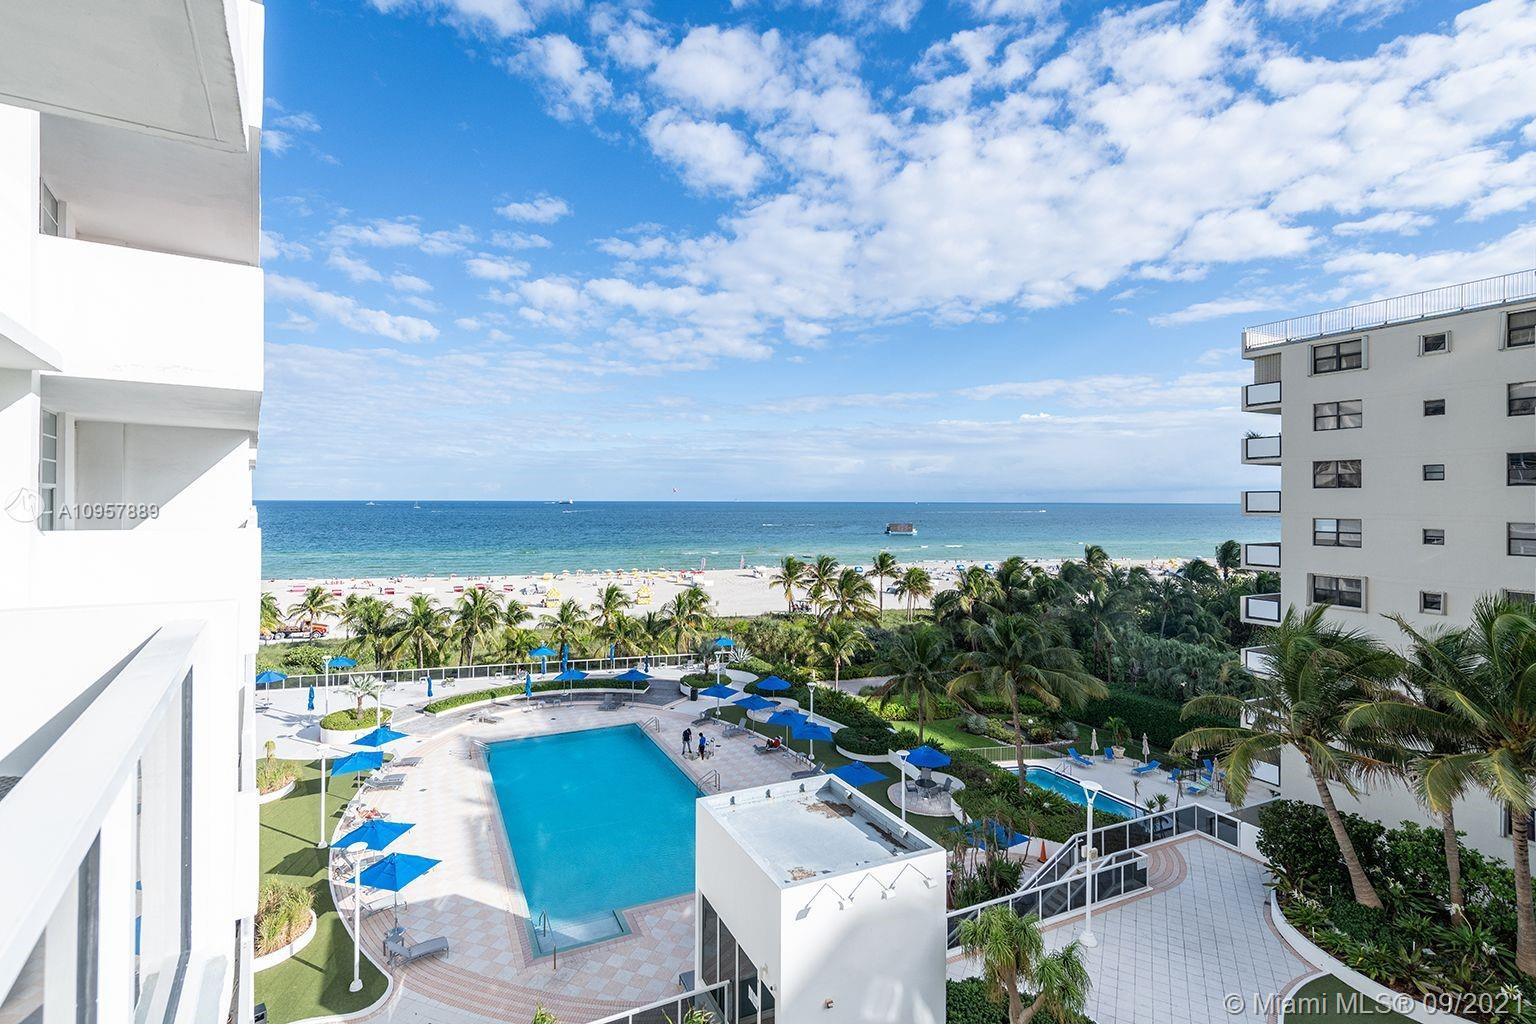 Decoplage #736 - 100 Lincoln Rd #736, Miami Beach, FL 33139